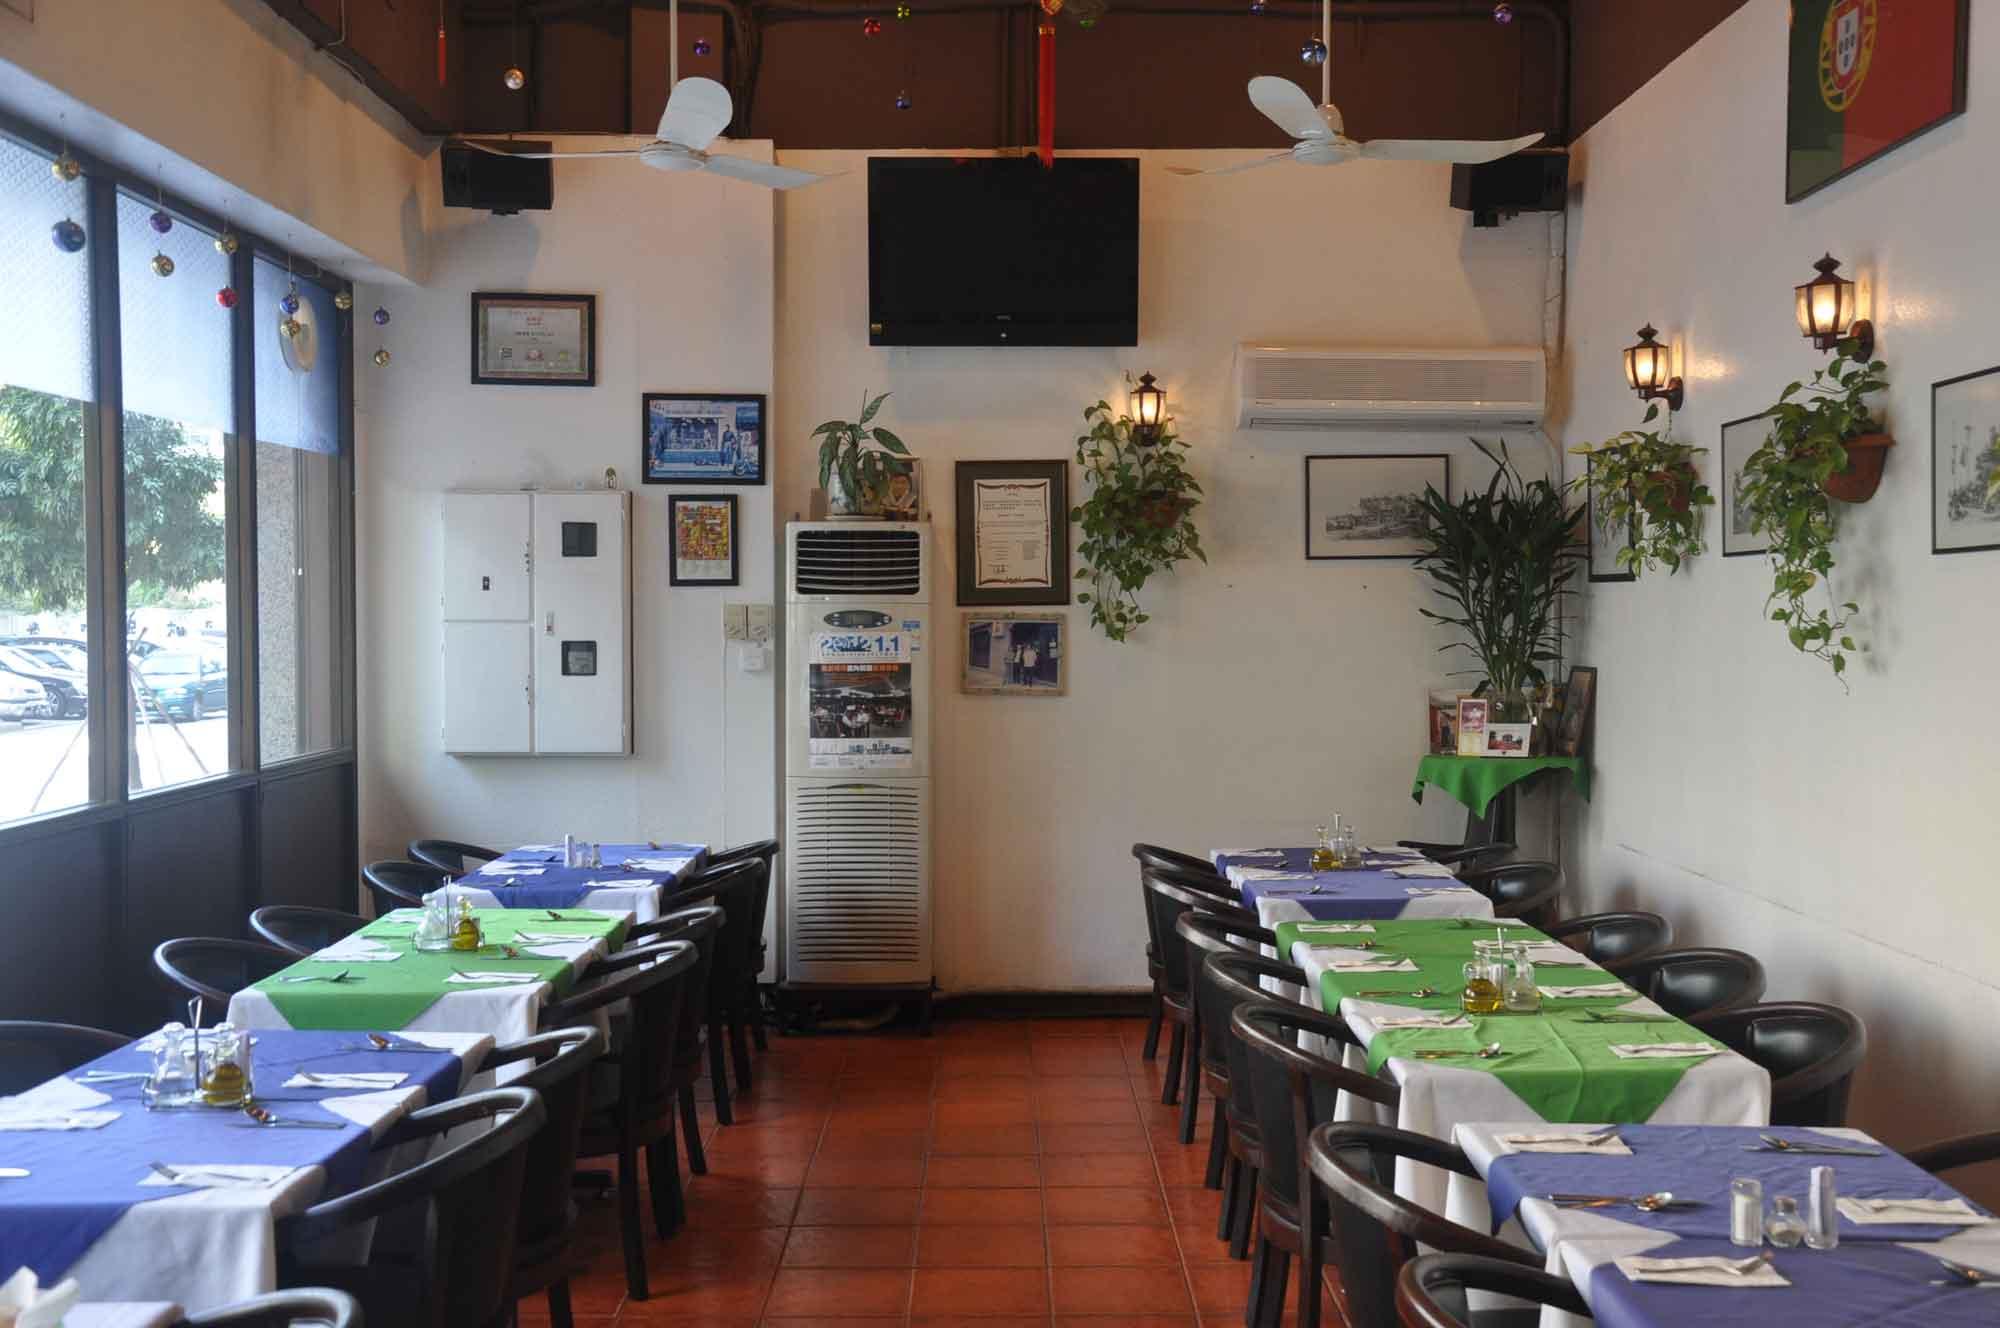 Carlos Restaurant Macau interior